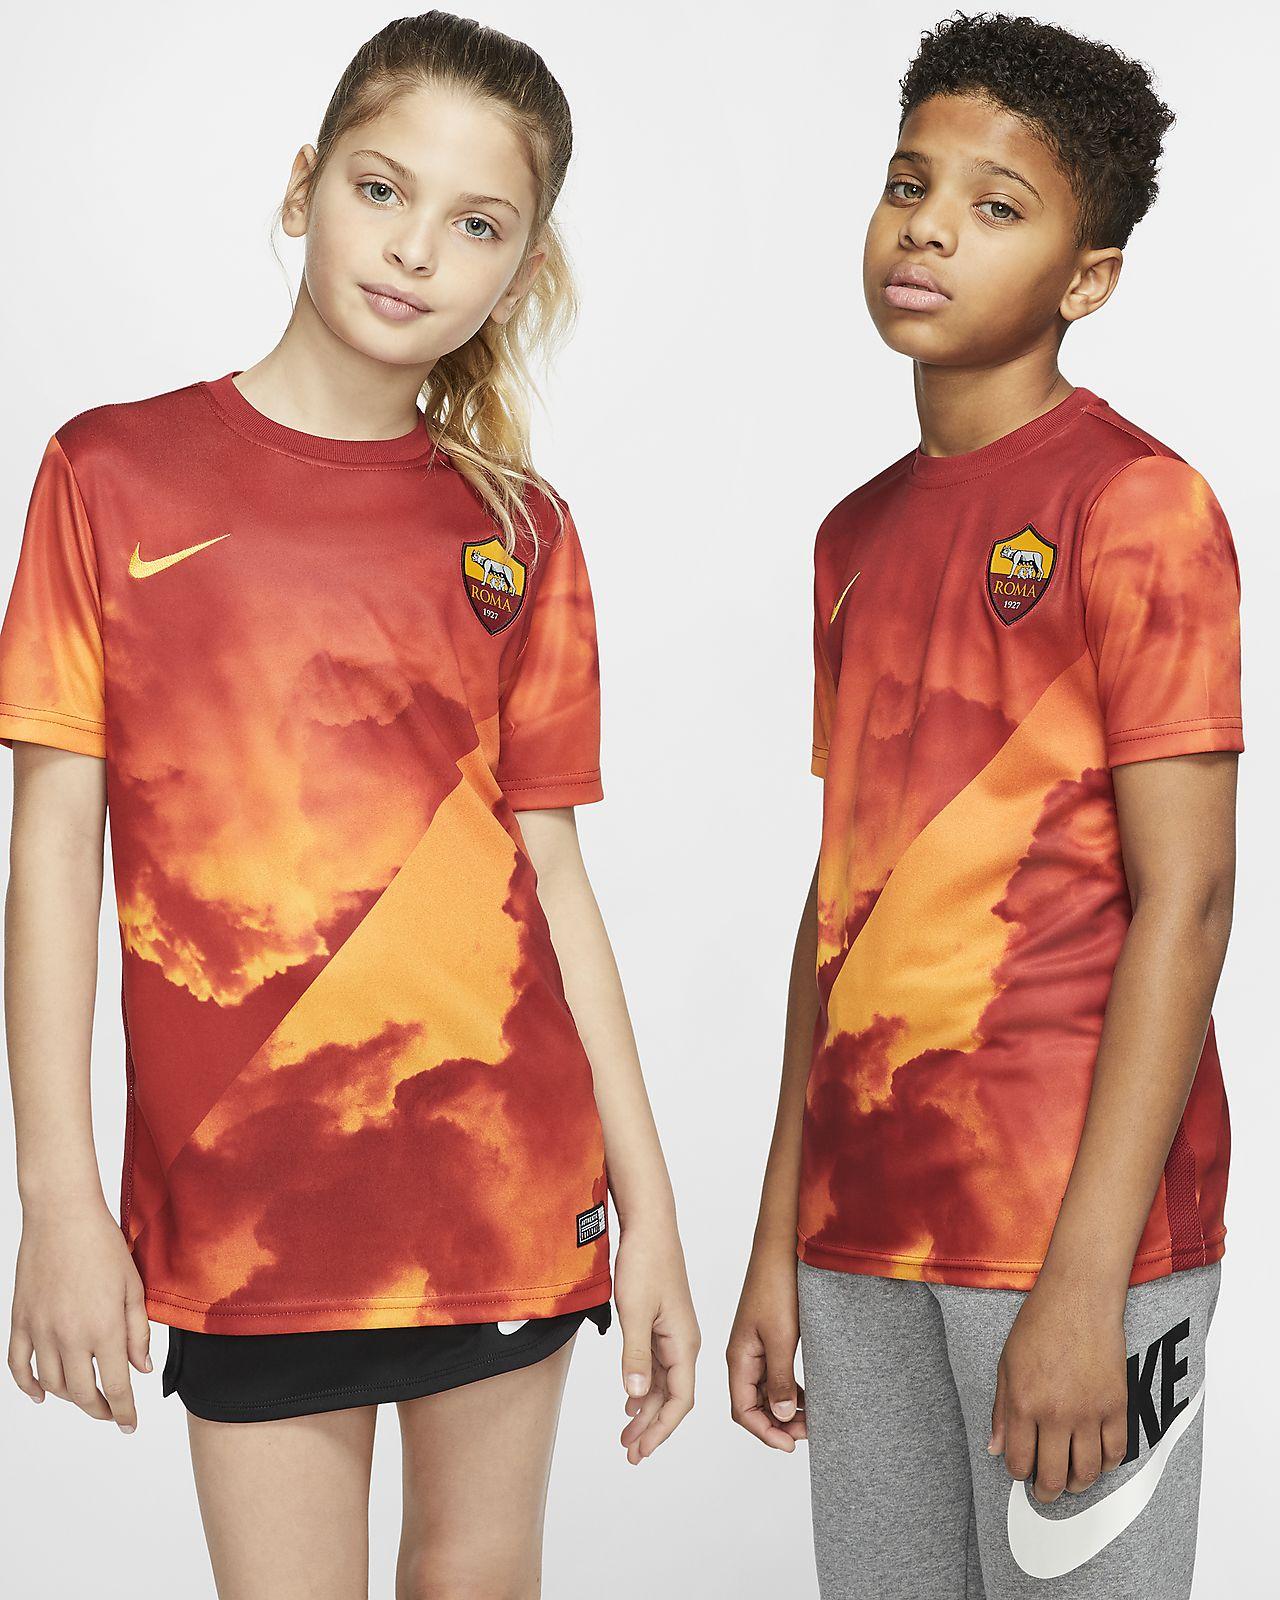 A.S. Rom Kurzarm-Fußballoberteil für Kinder